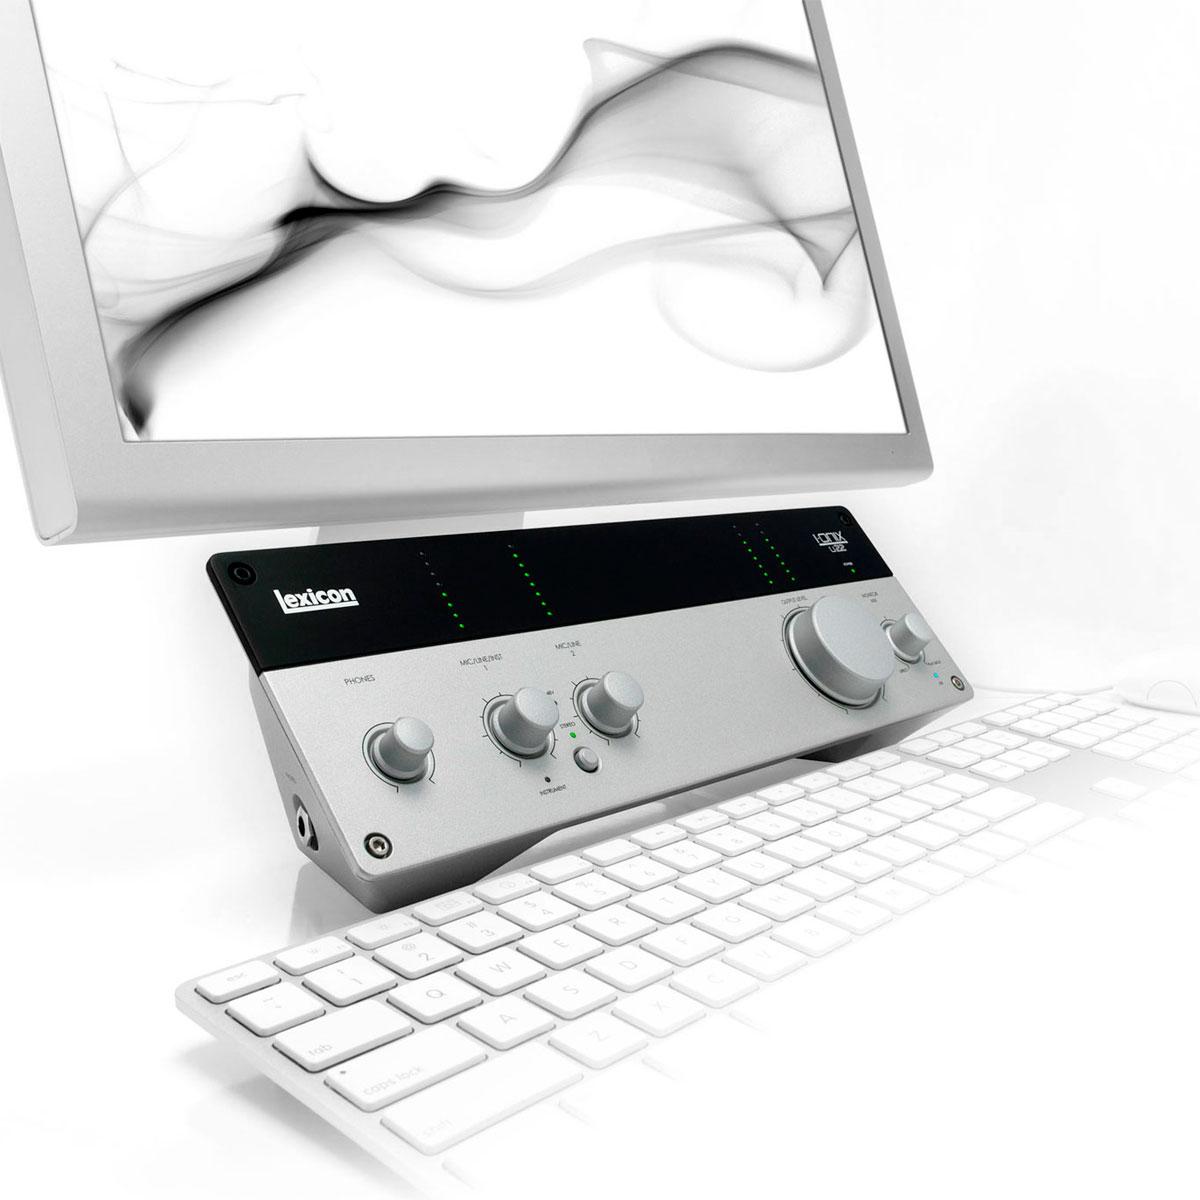 IOnixU22S - Placa de Som Externa USB I Onix U 22 S - Lexicon